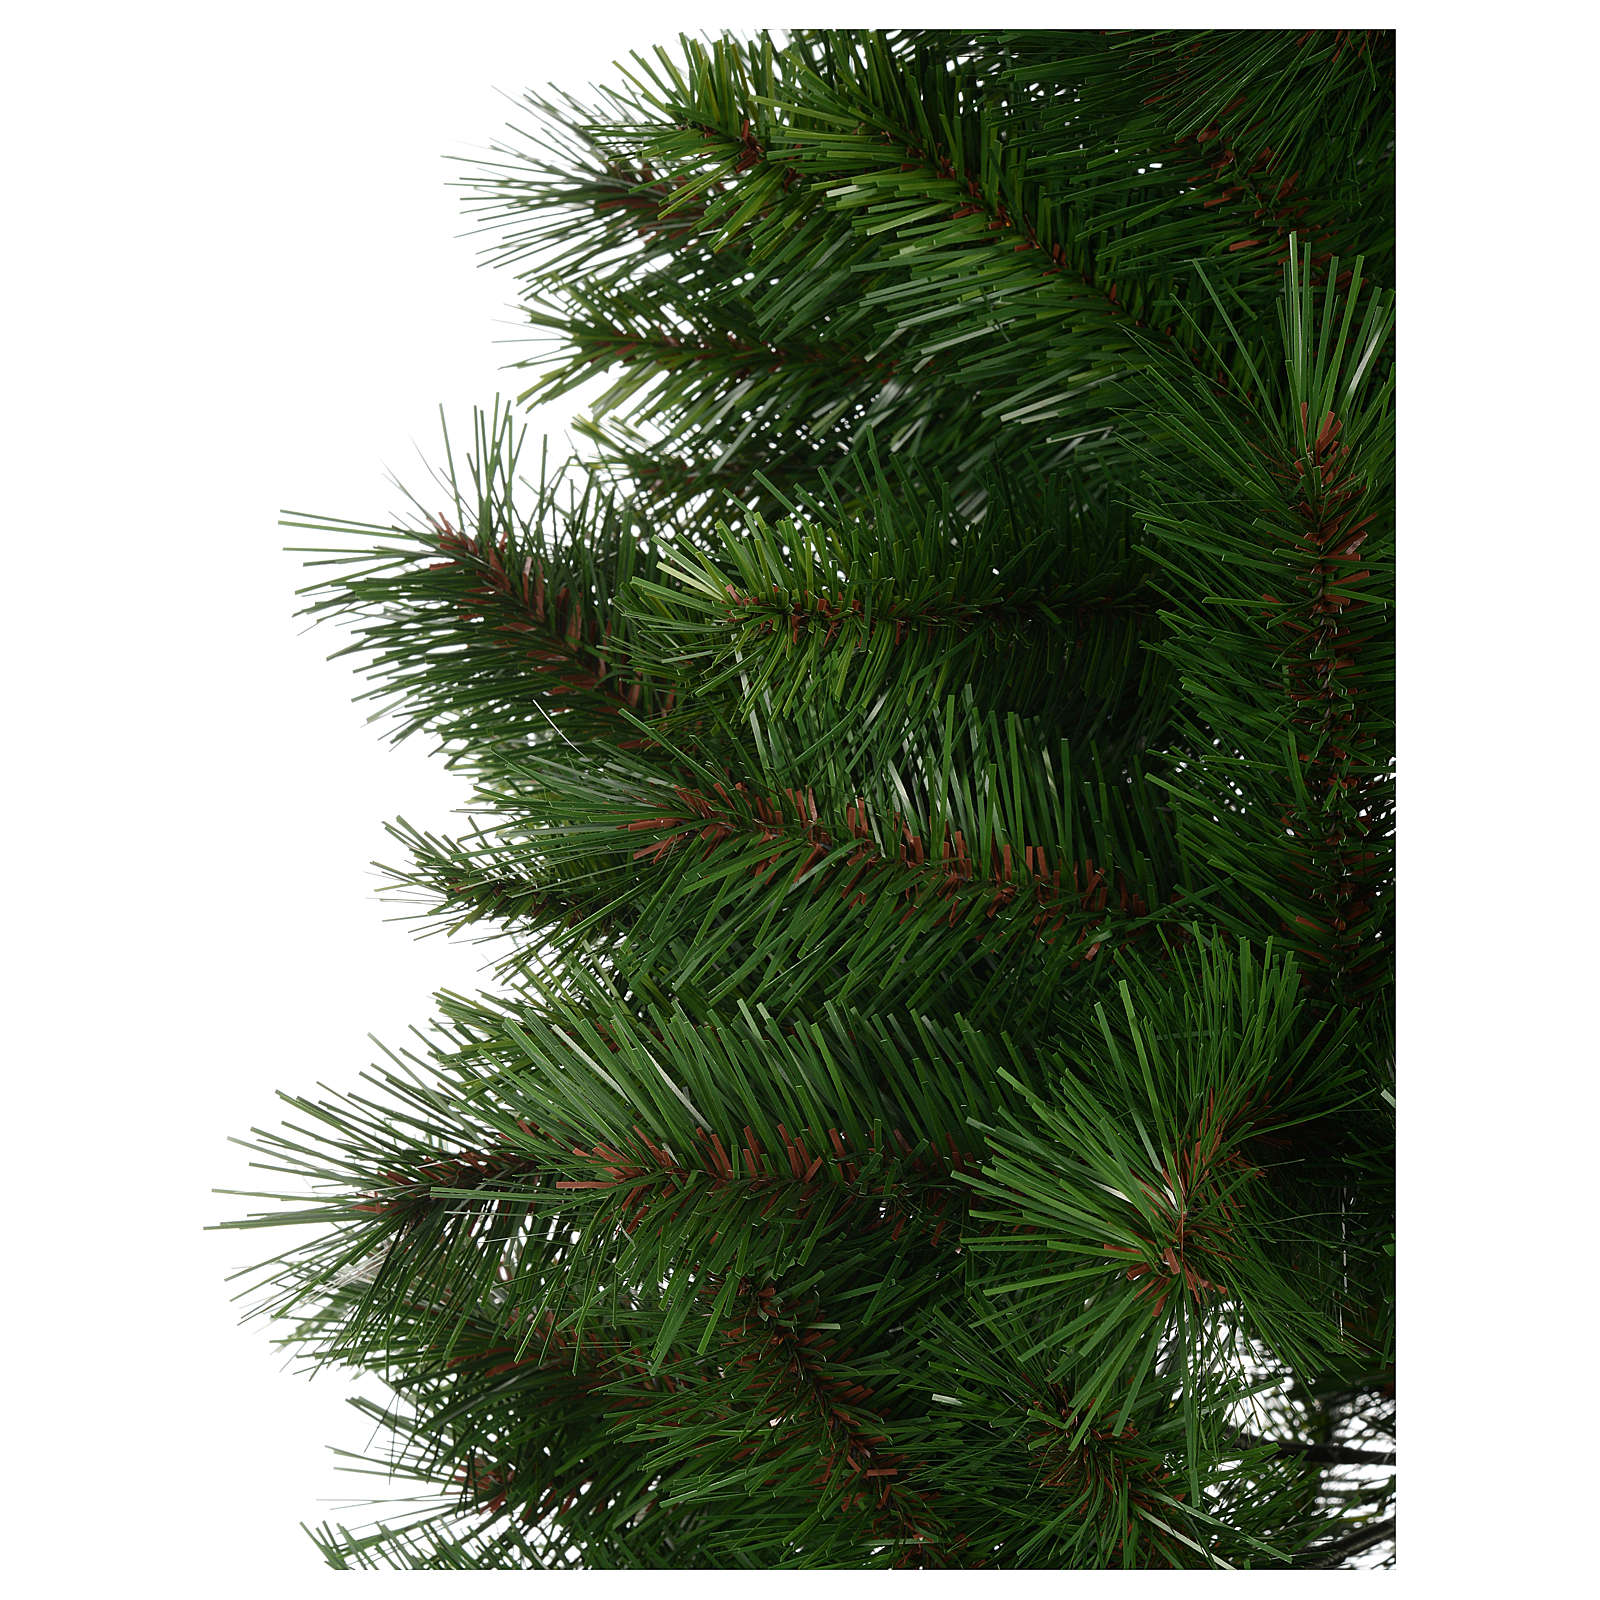 Albero Di Natale Slim 210.Albero Di Natale 210 Cm Slim Colore Verde Alexander Vendita Online